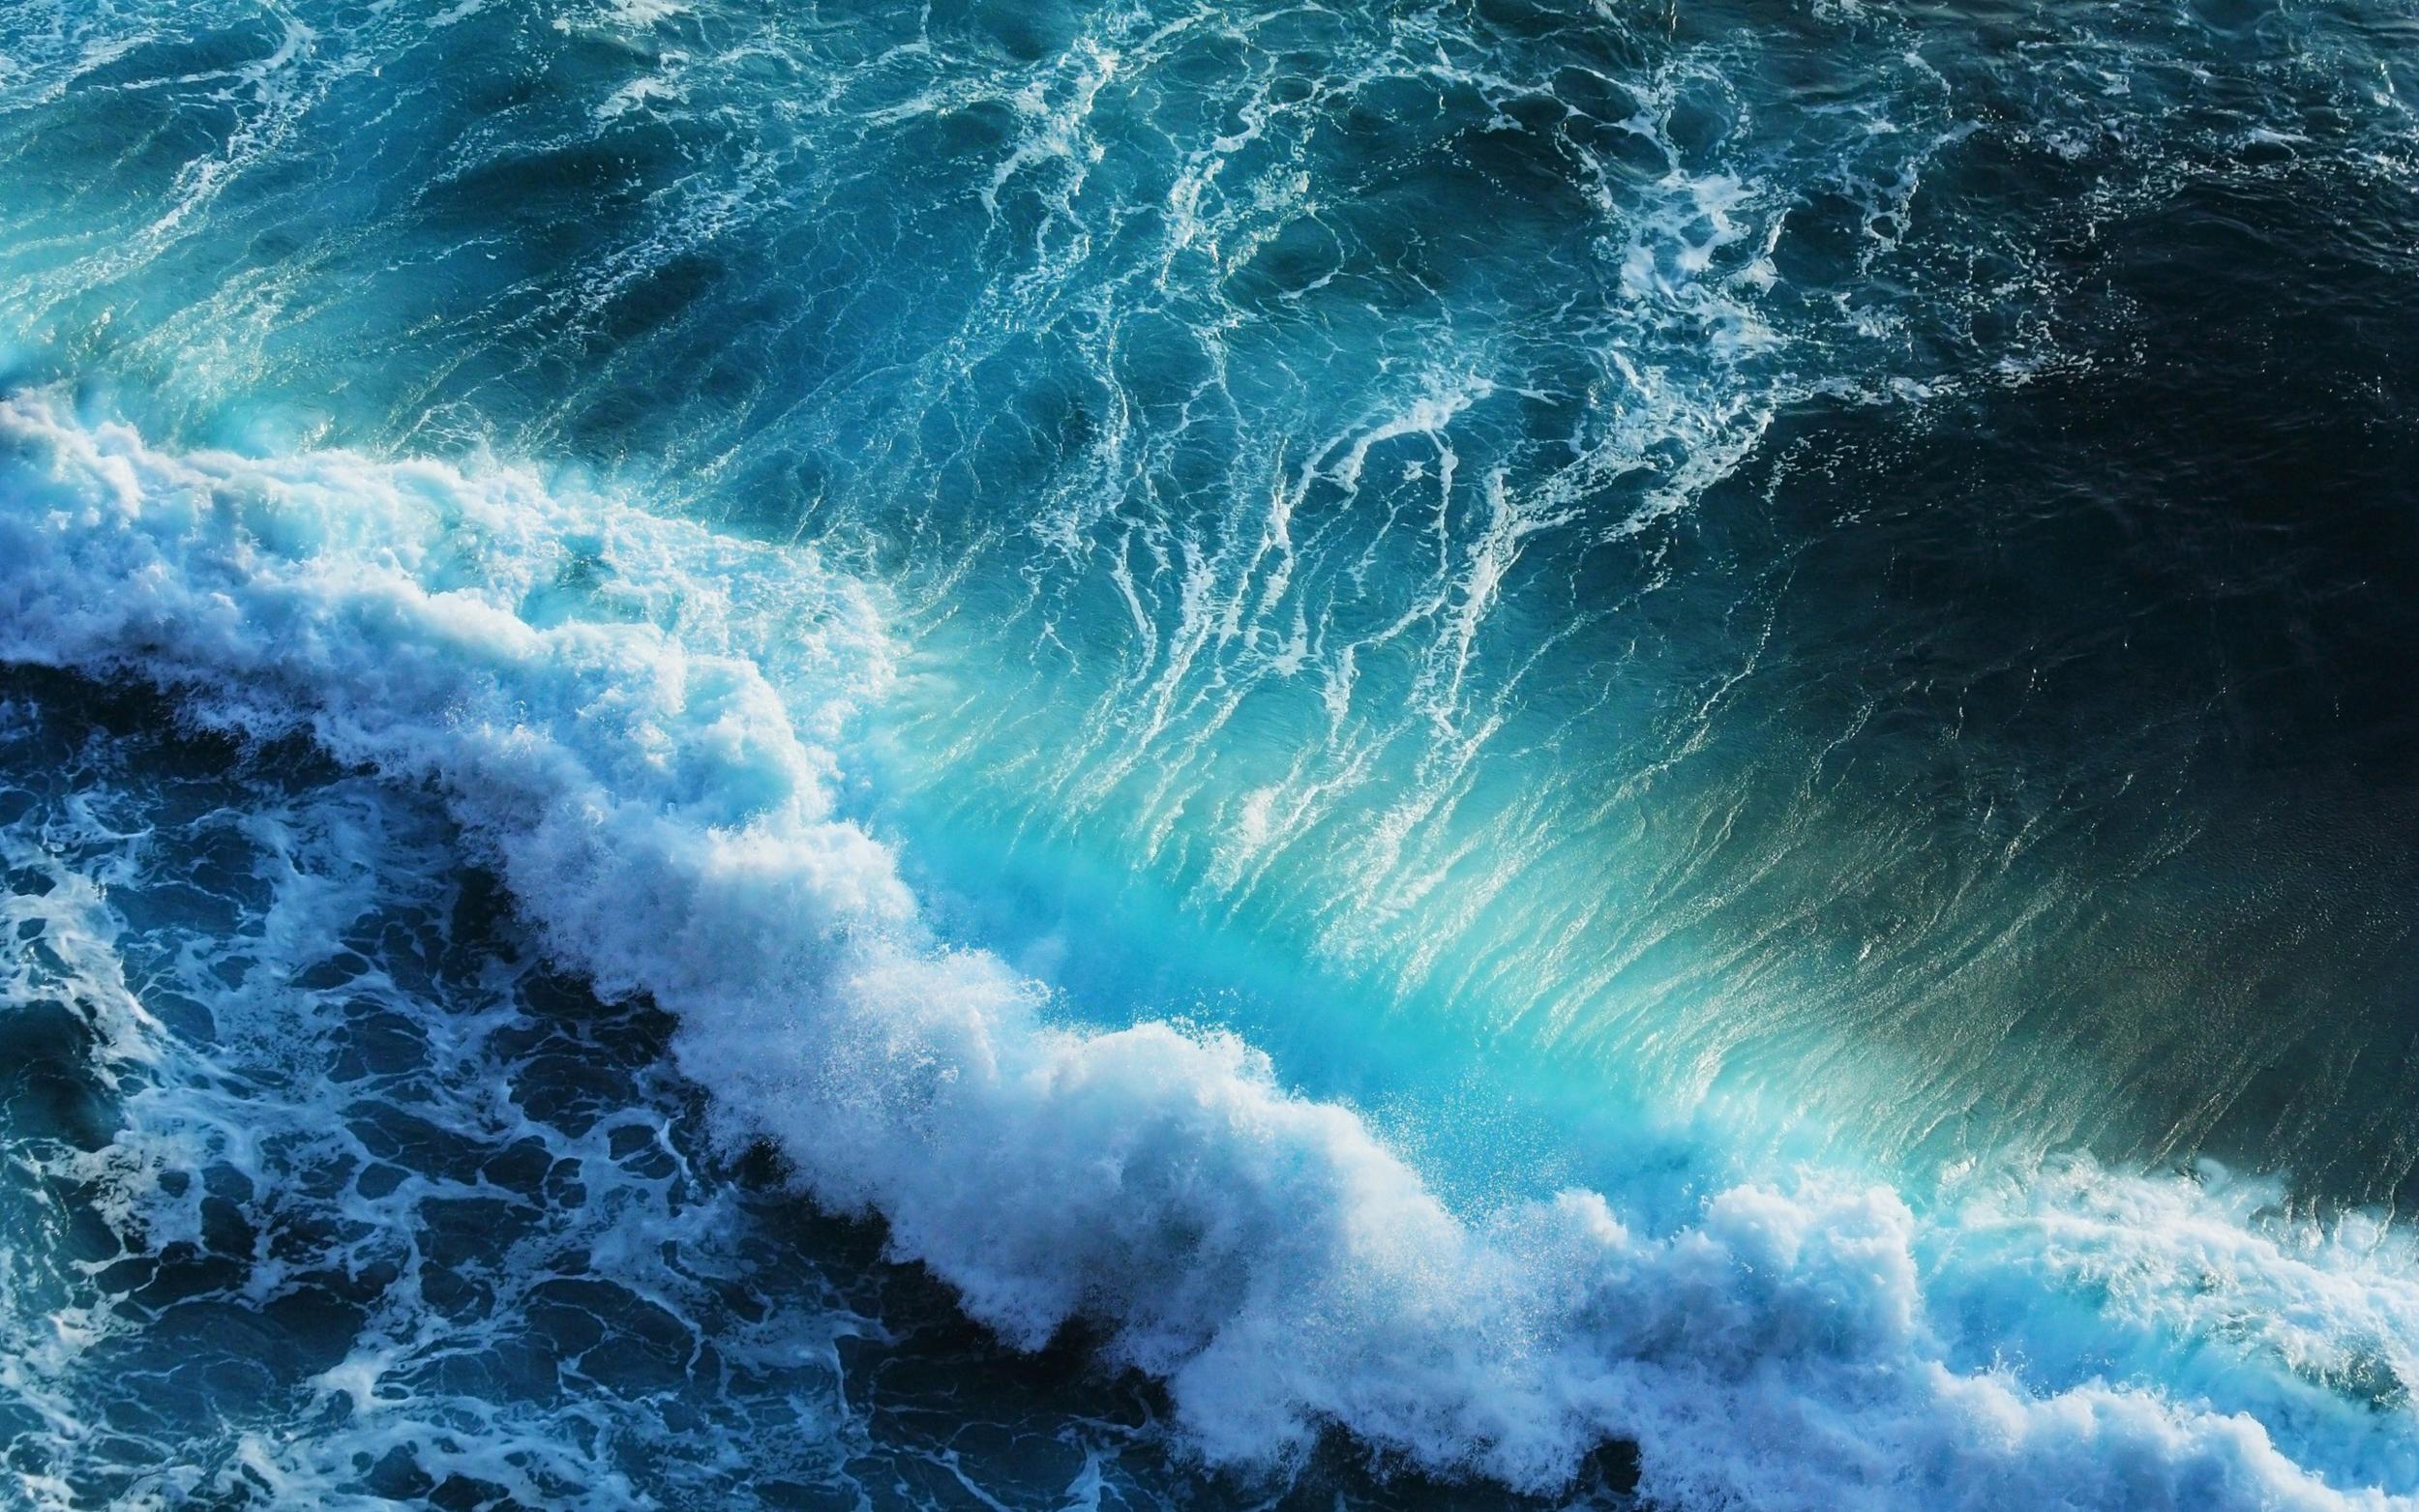 Ocean-Wave-Wallpaper-Free-Download.png